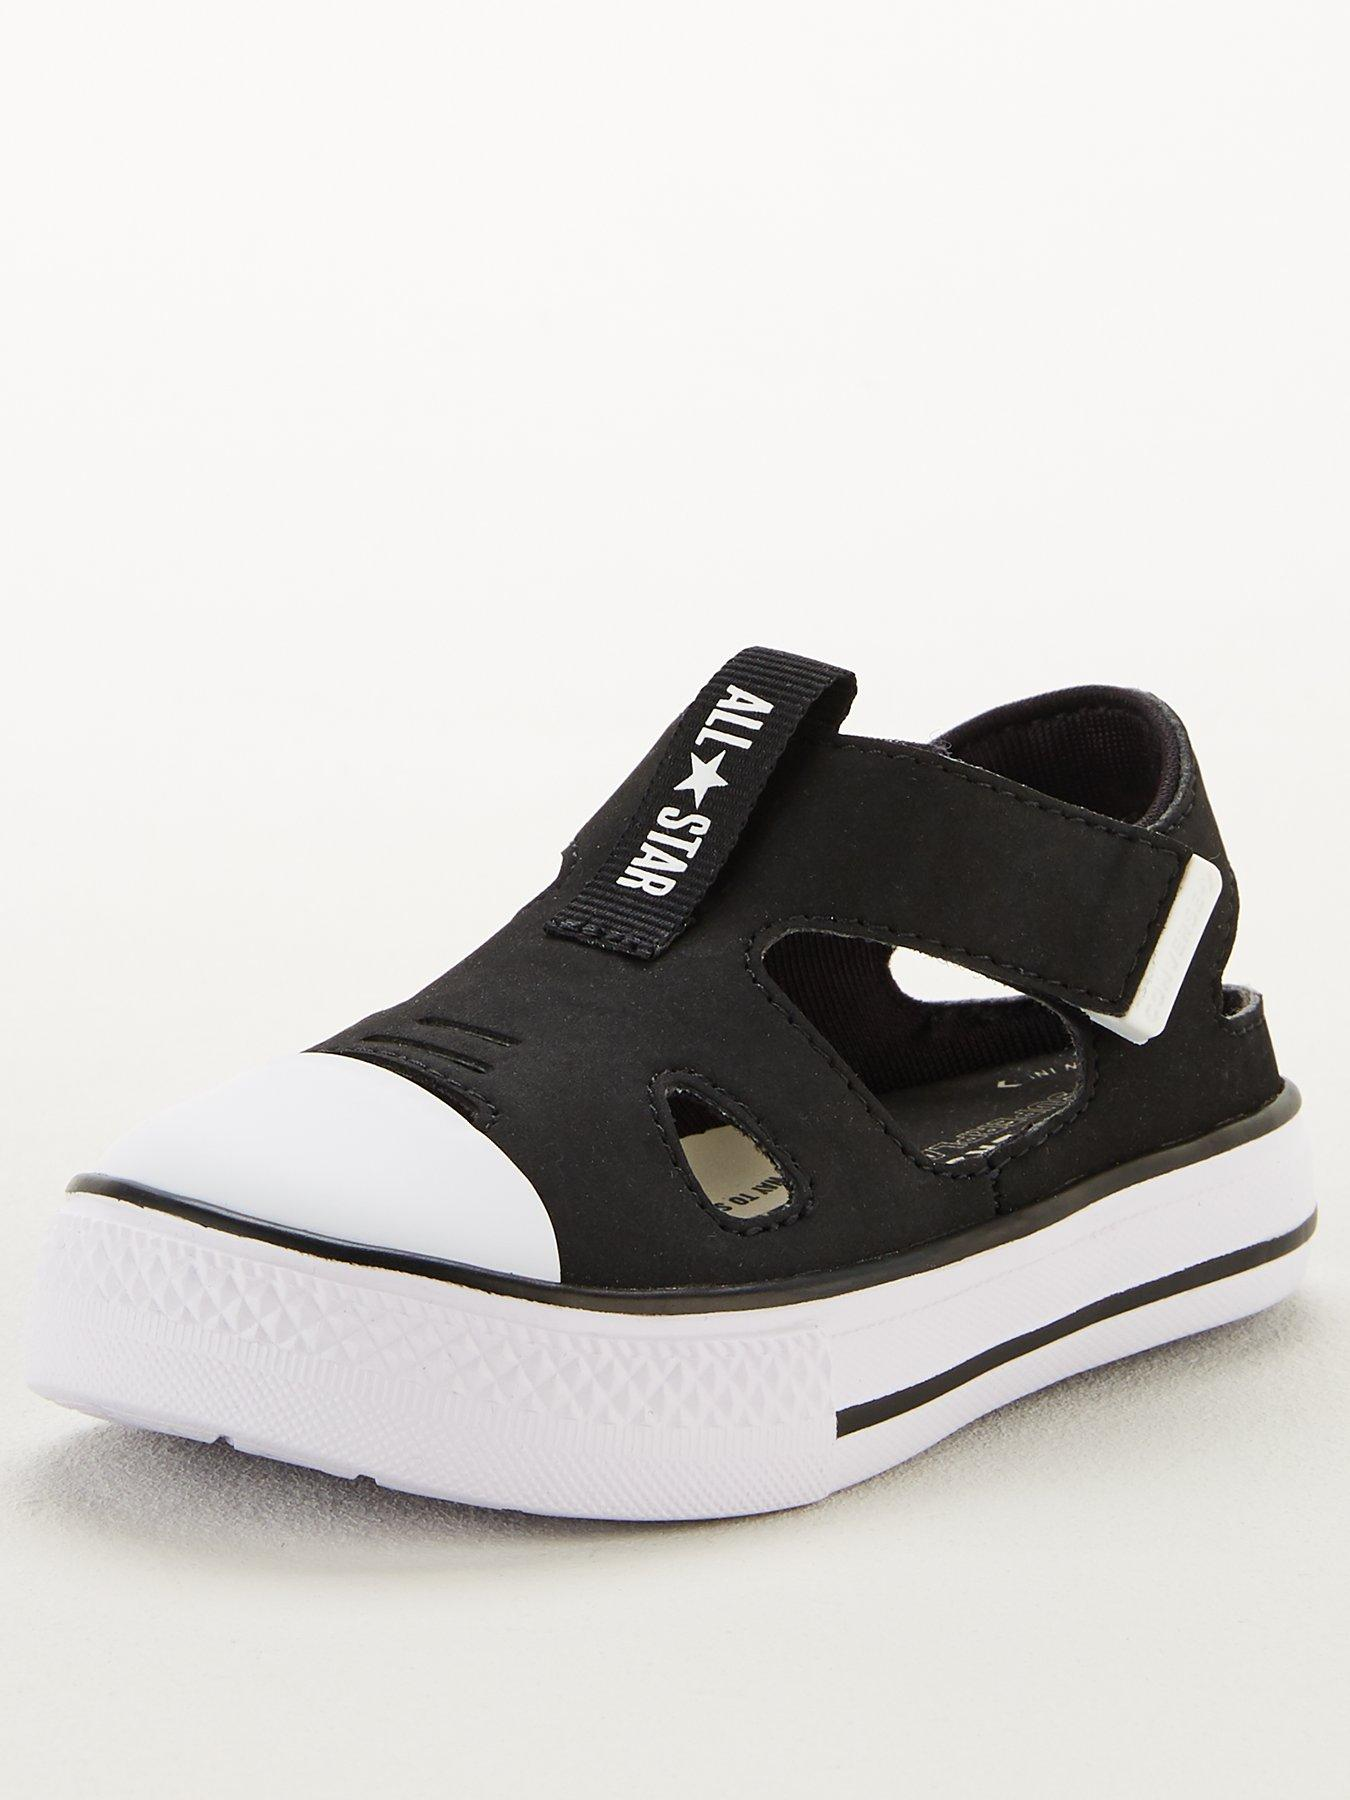 Converse Kids \u0026 Baby Shoes \u0026 Clothing